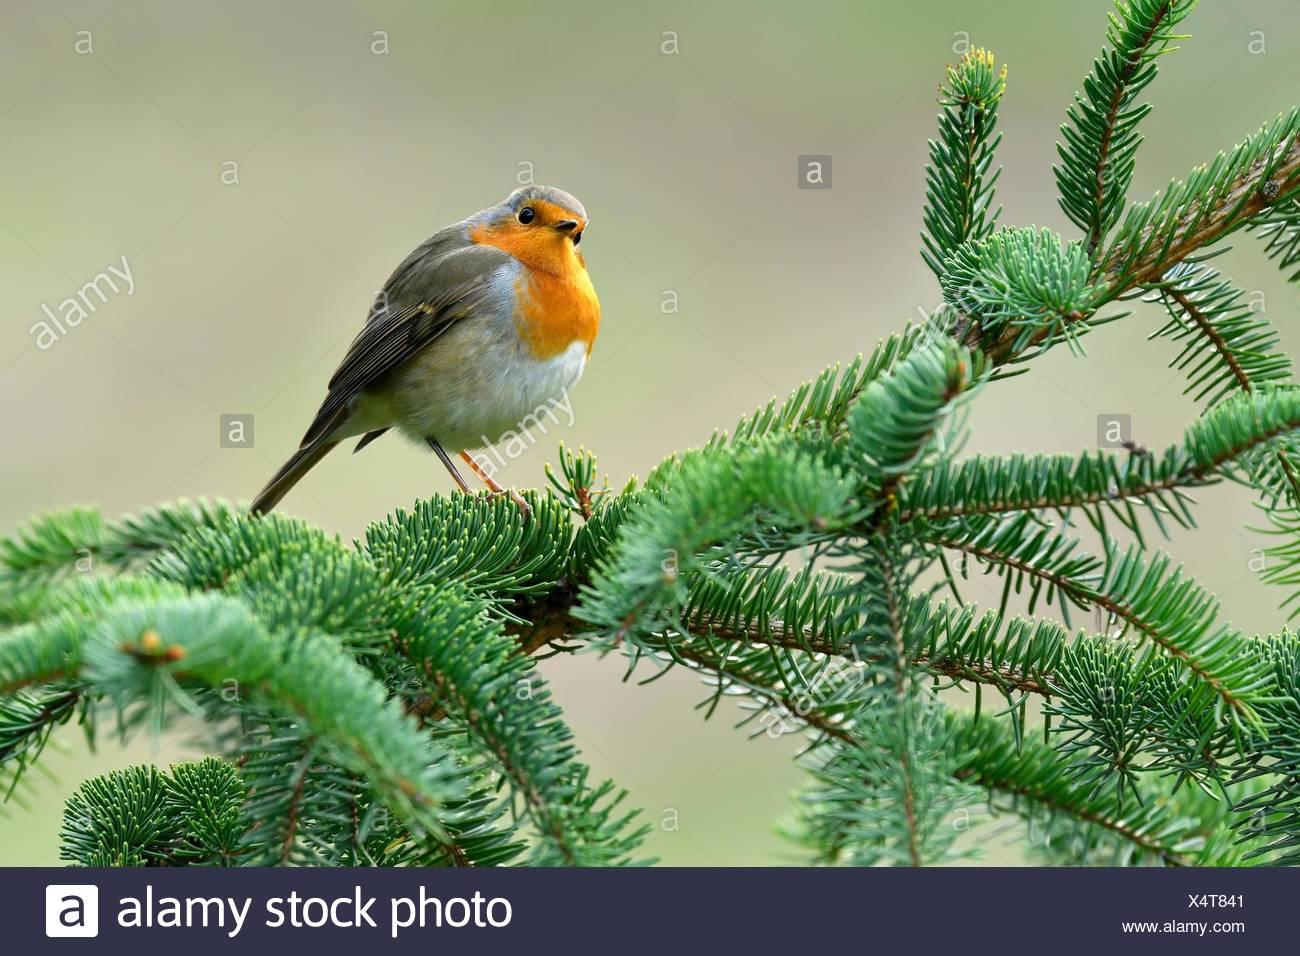 European robin (Erithacus rubecula), sits on fir branch, Canton Zug, Switzerland - Stock Image